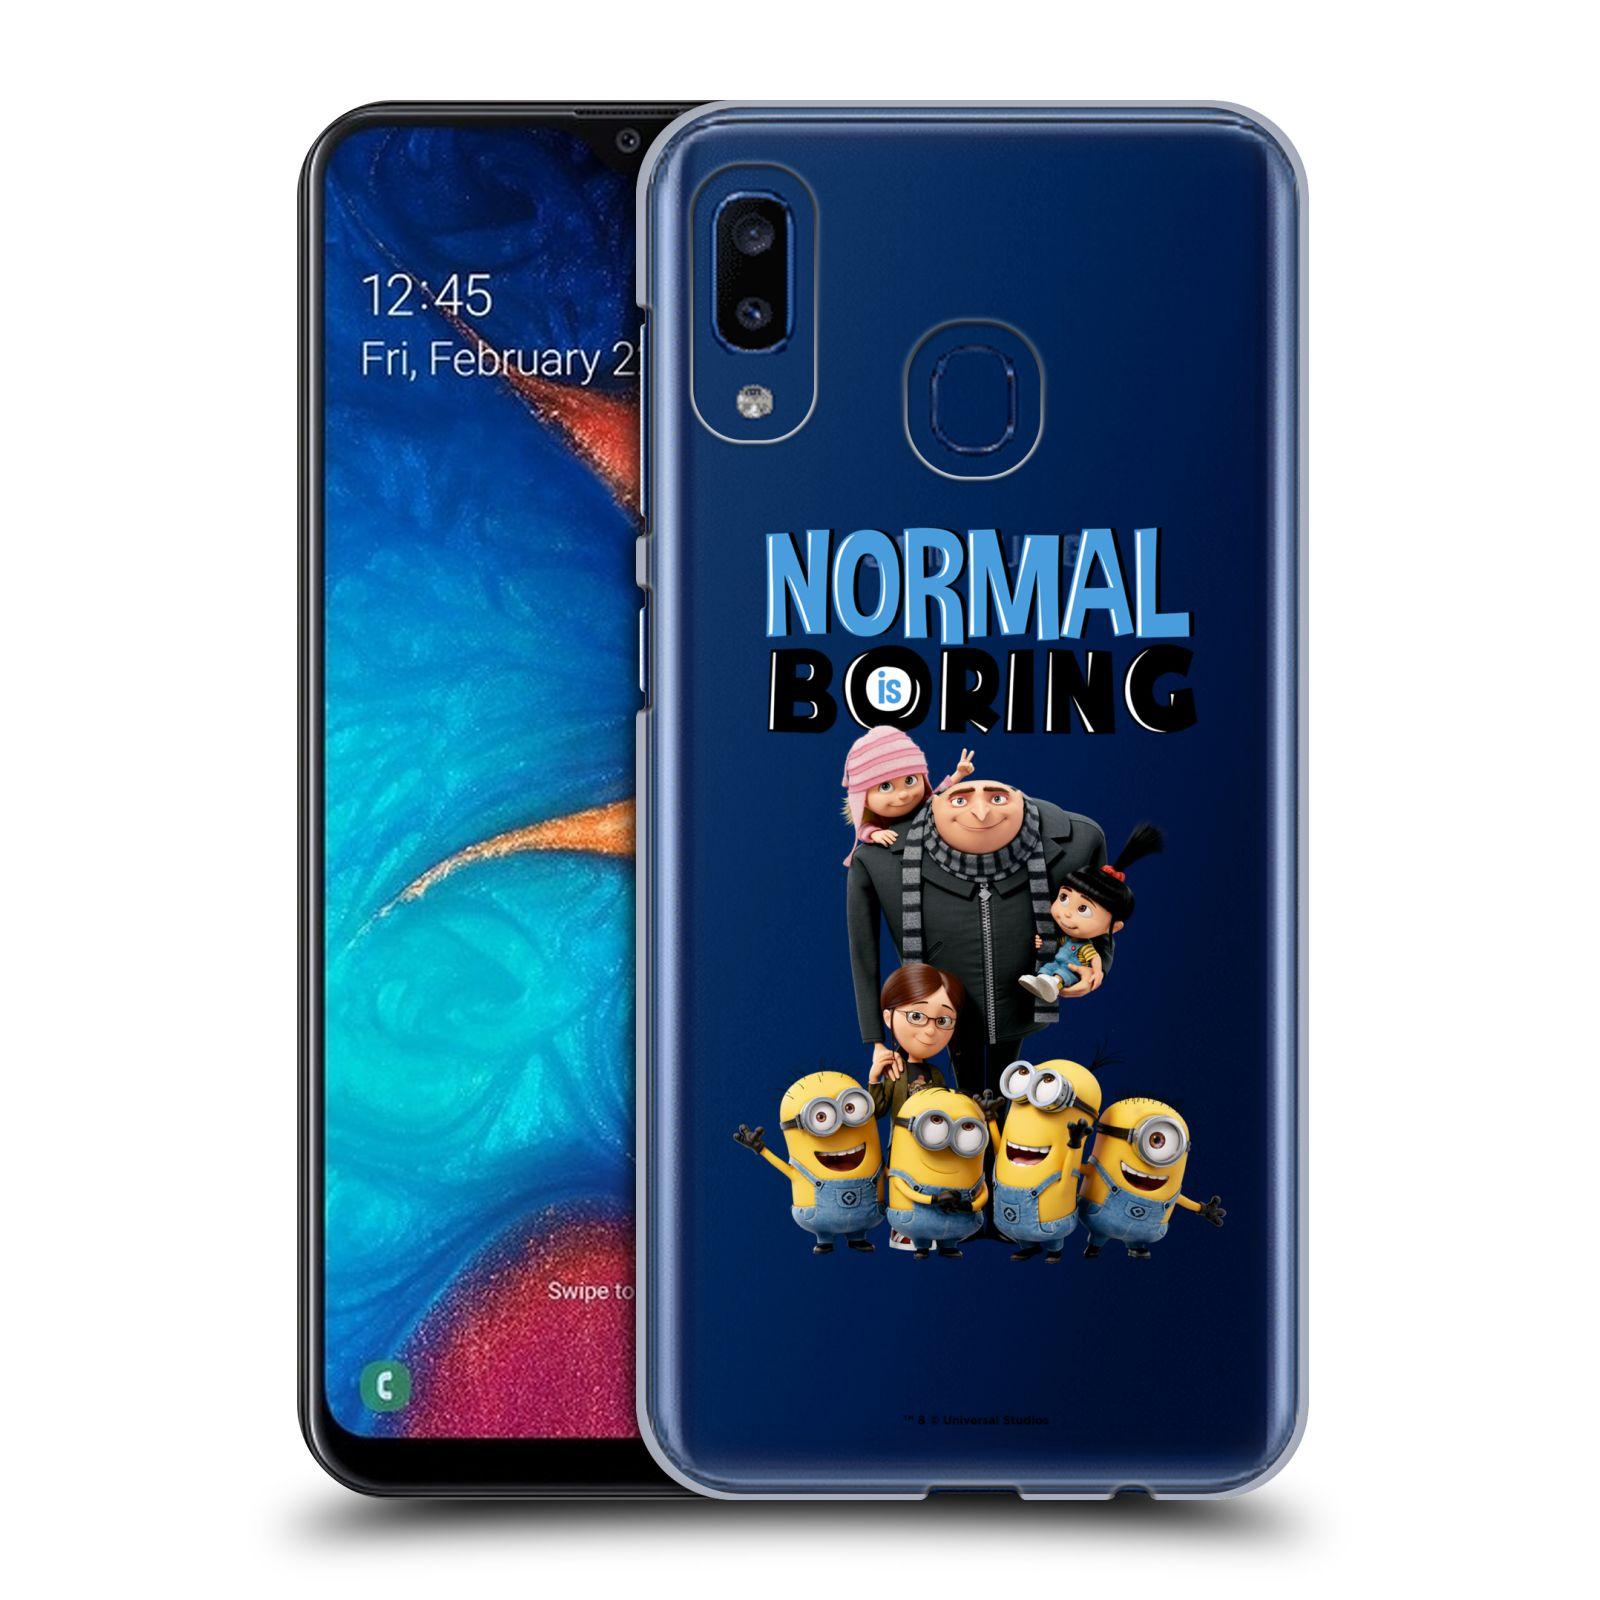 Plastové pouzdro na mobil Samsung Galaxy A20 - Head Case - Normal is boring z filmu Já, padouch - Despicable Me